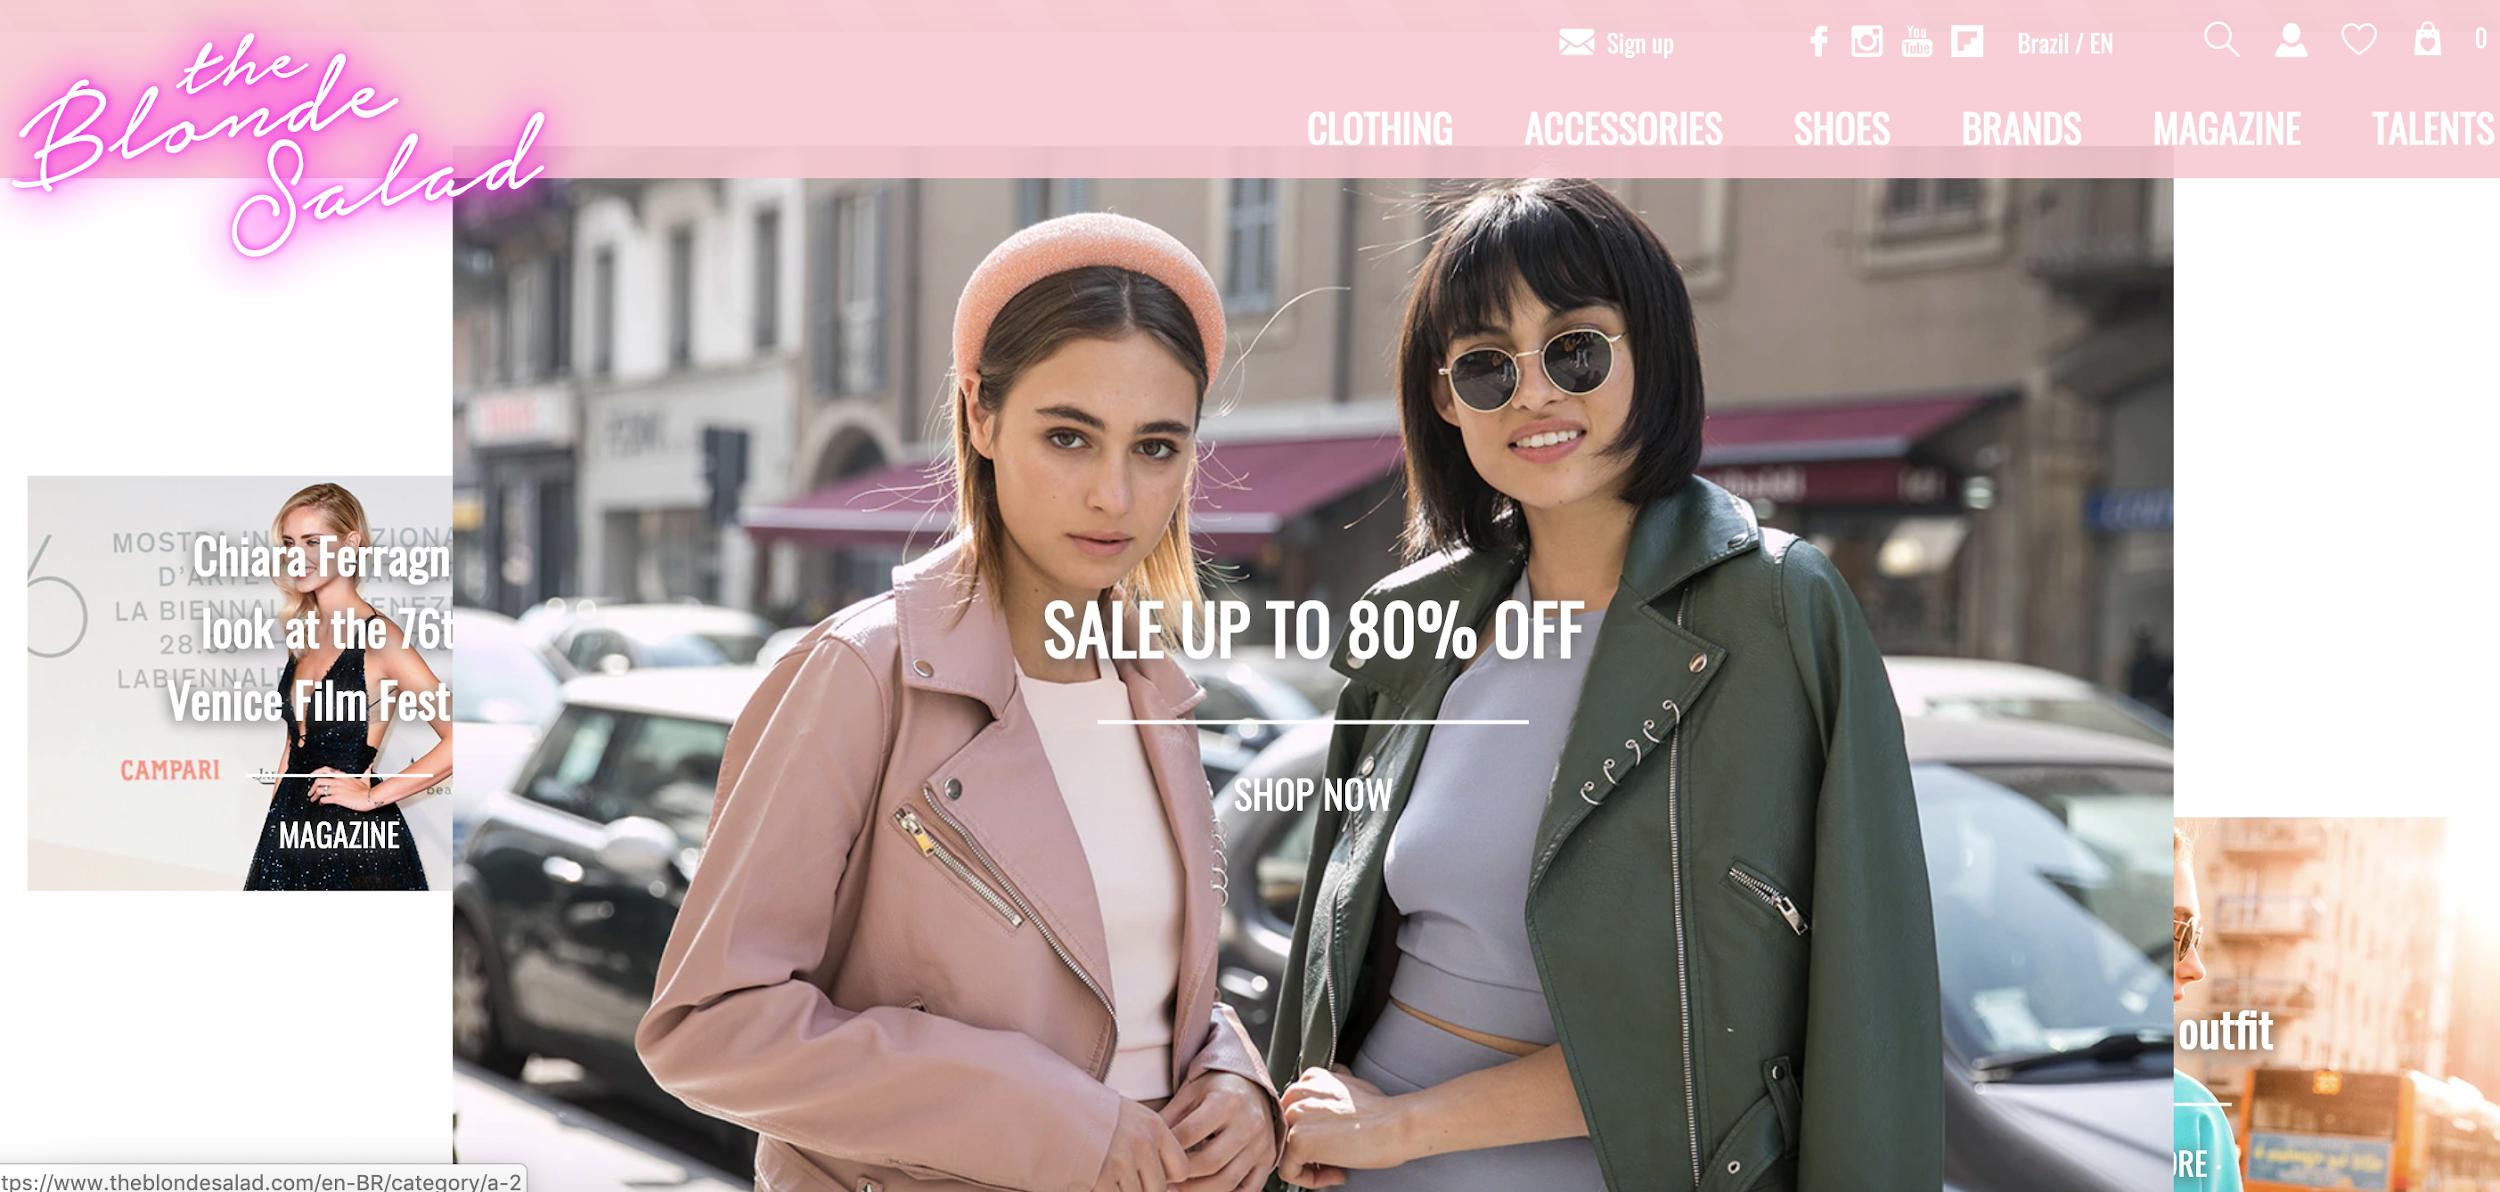 chiara ferragni como exemplo de blogueira de sucesso